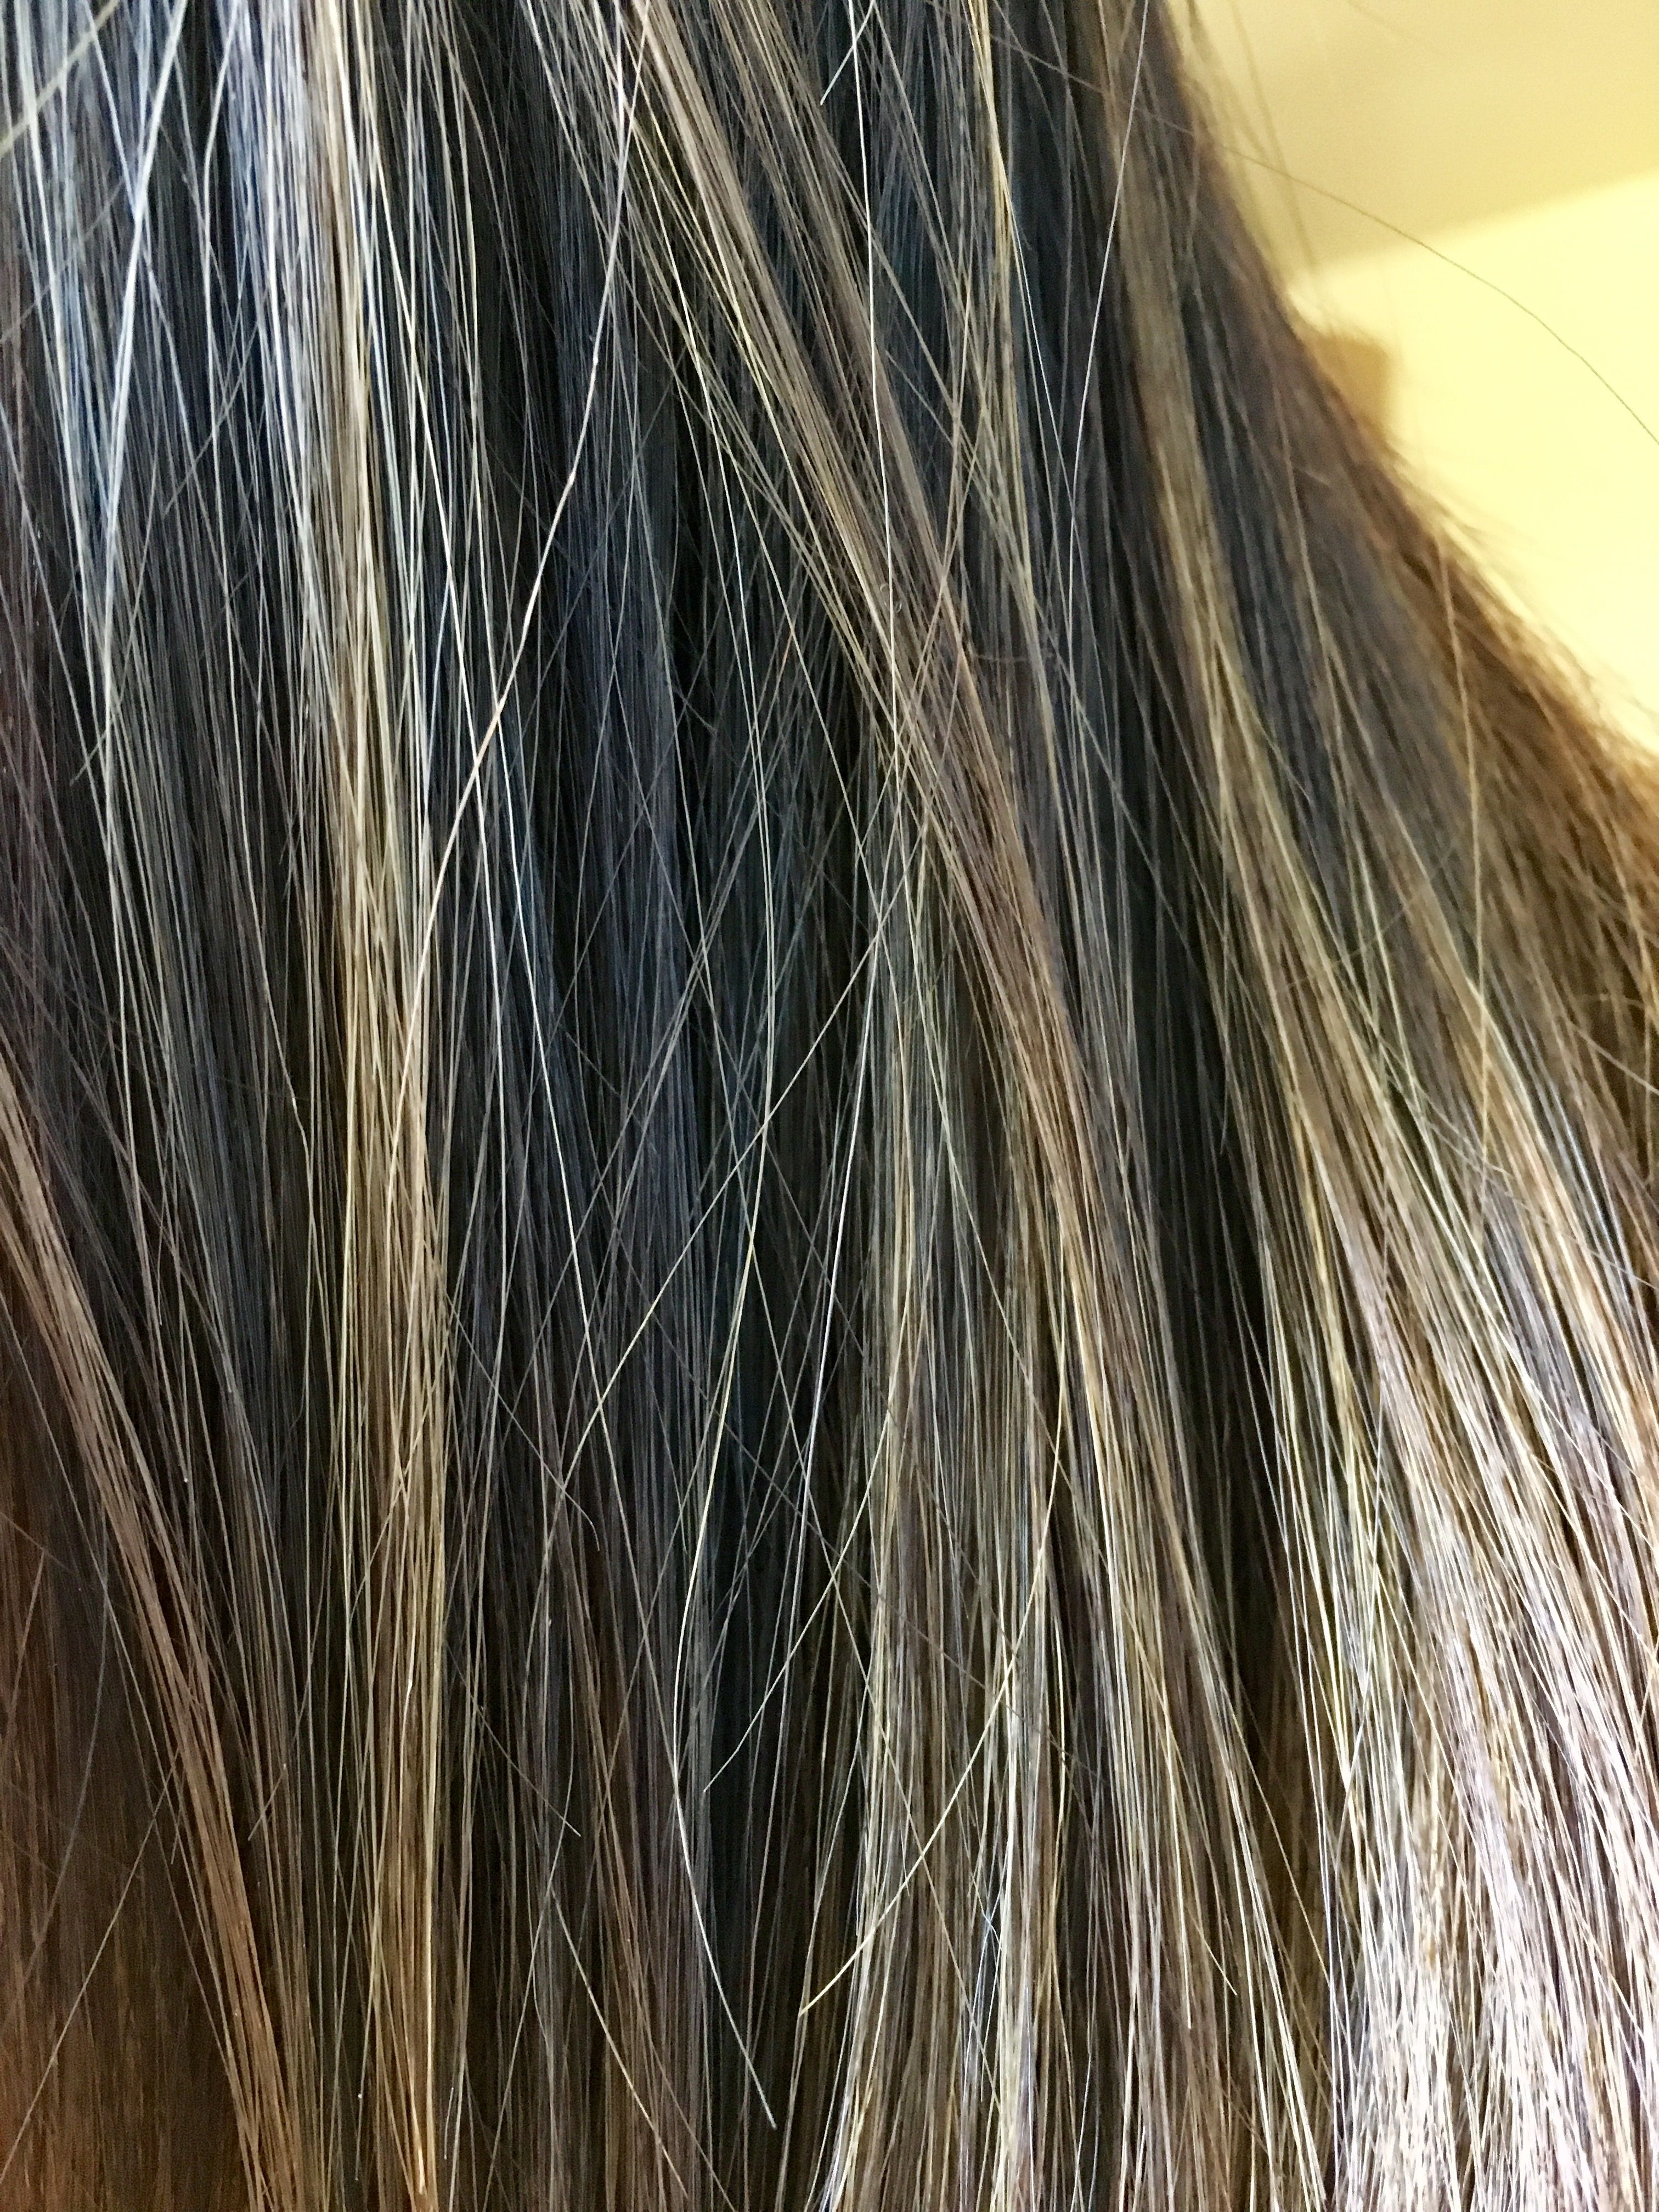 hair blonde brown black ombre balayage highlights strand light sunlight hair color hair. Black Bedroom Furniture Sets. Home Design Ideas